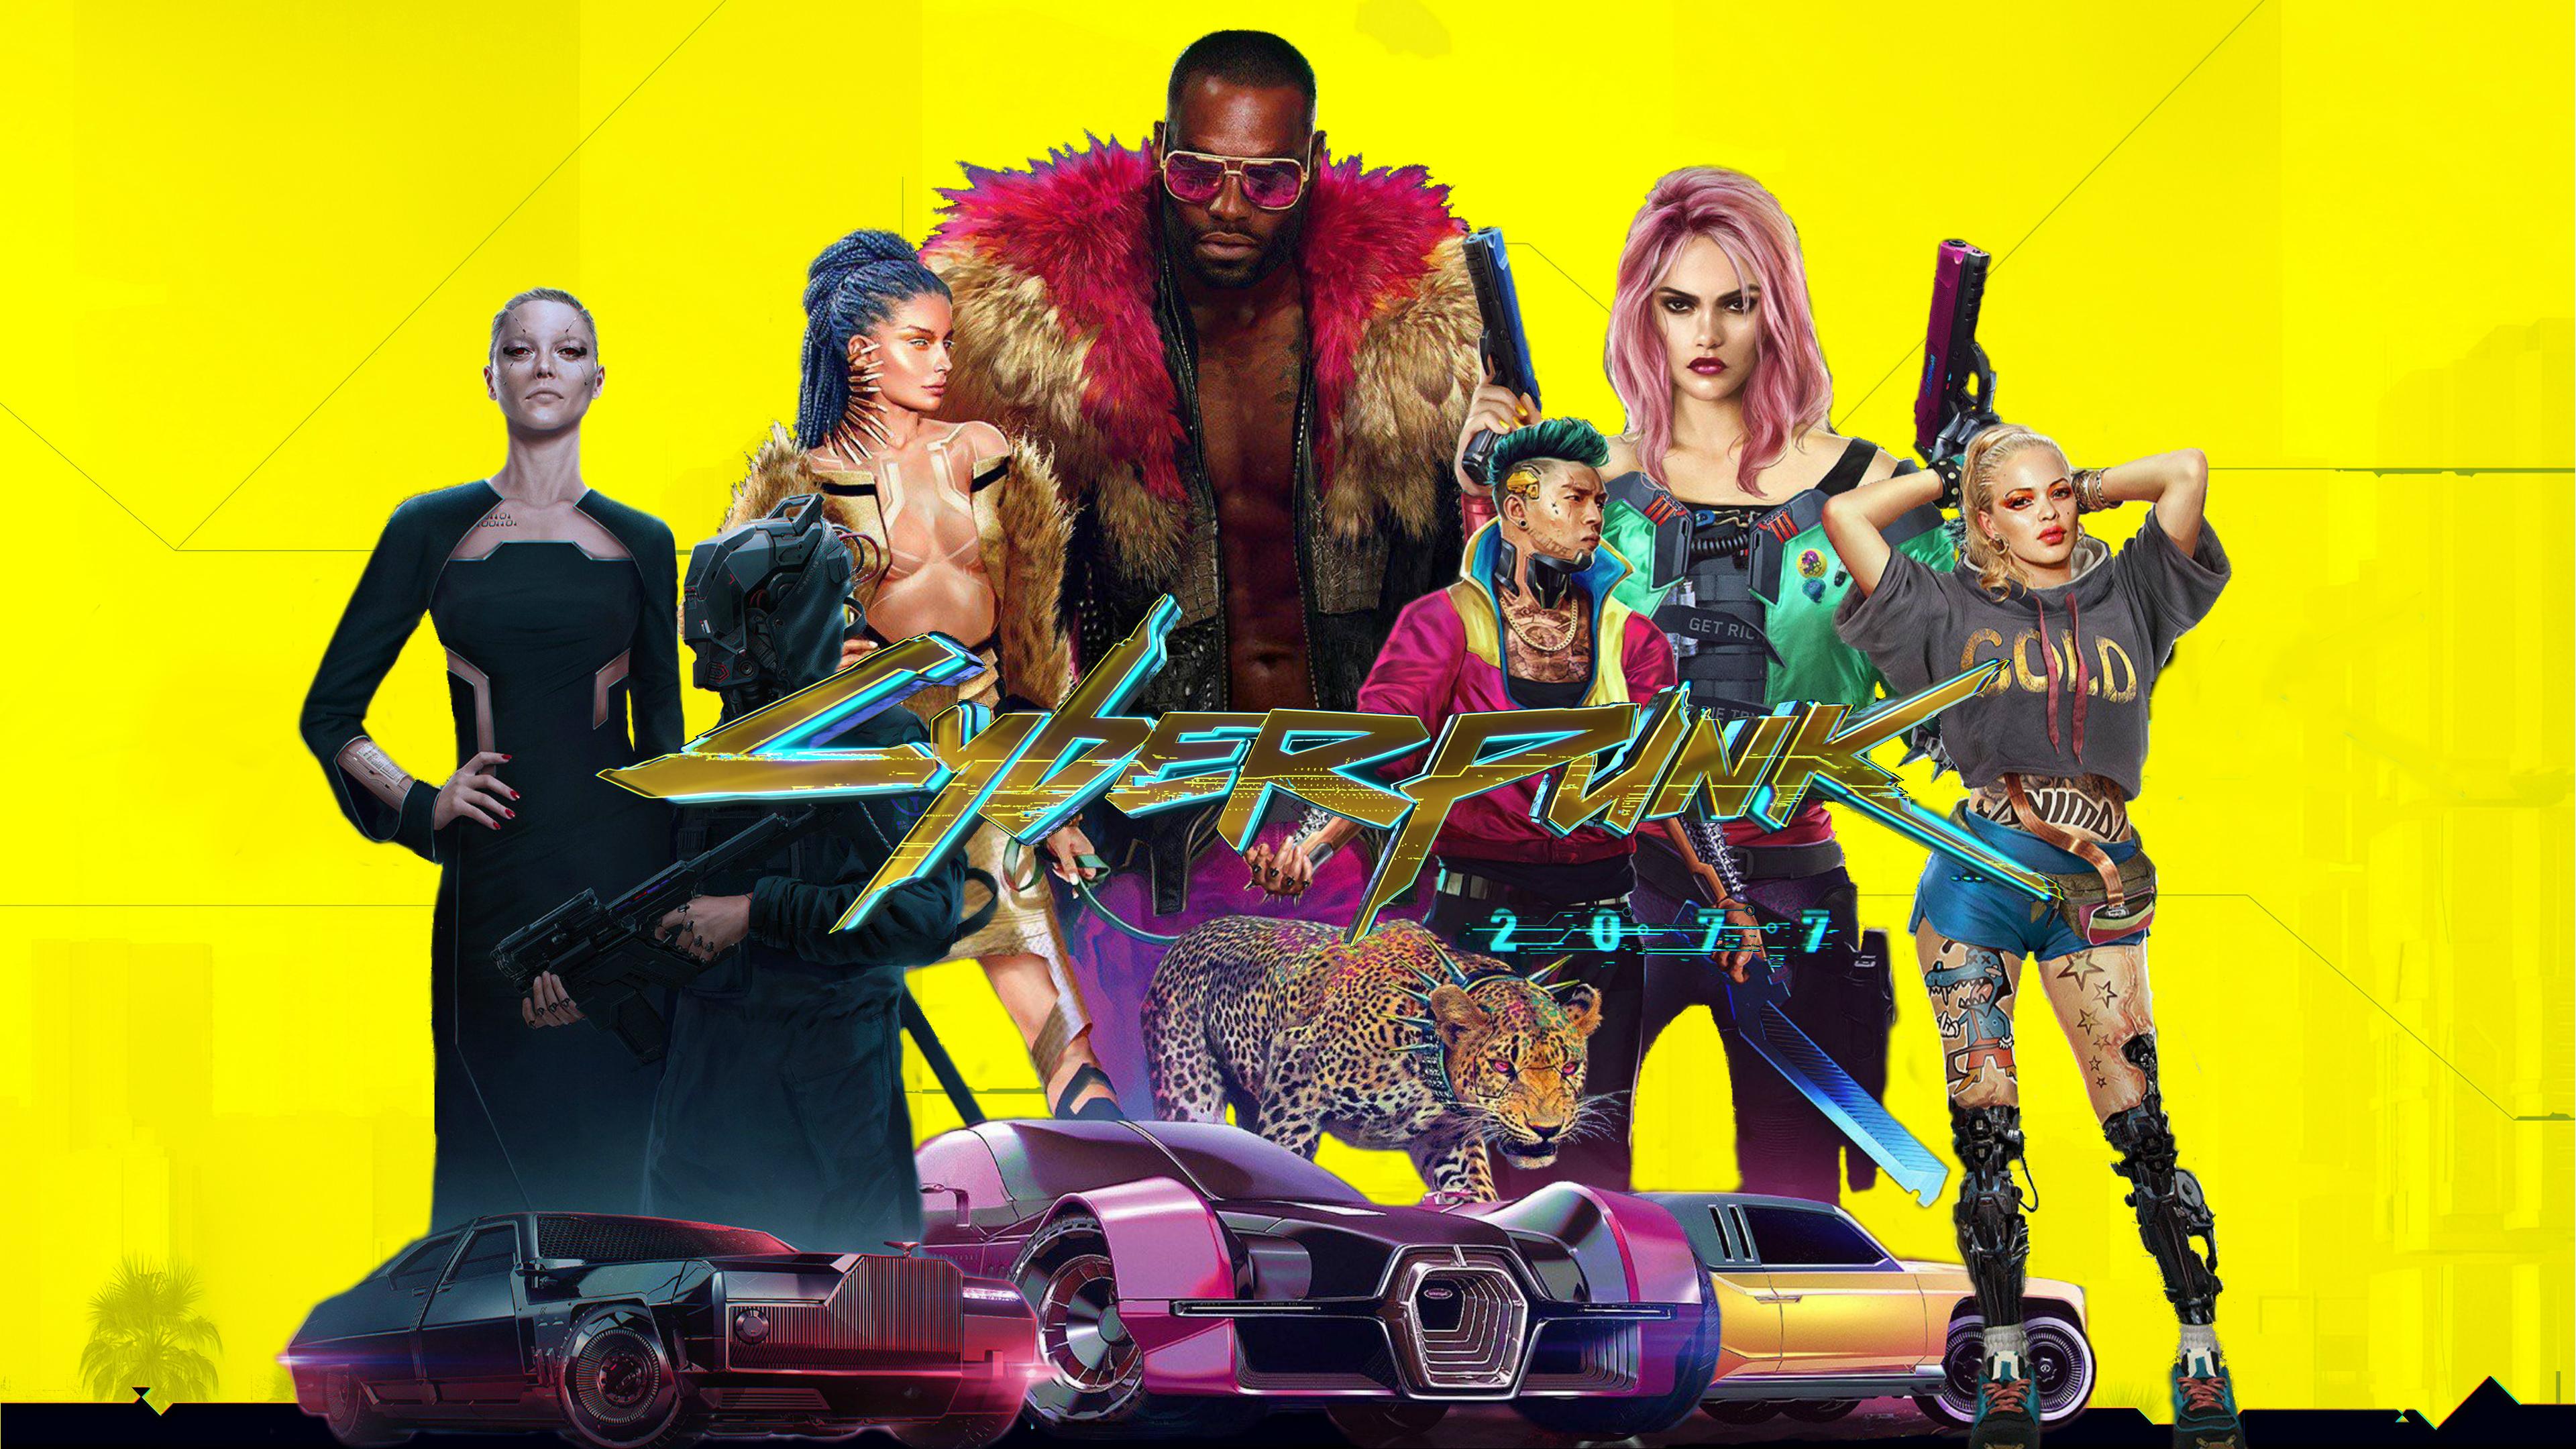 Cyberpunk 2077 Wallpaper Cyberpunk 2077, Cyberpunk